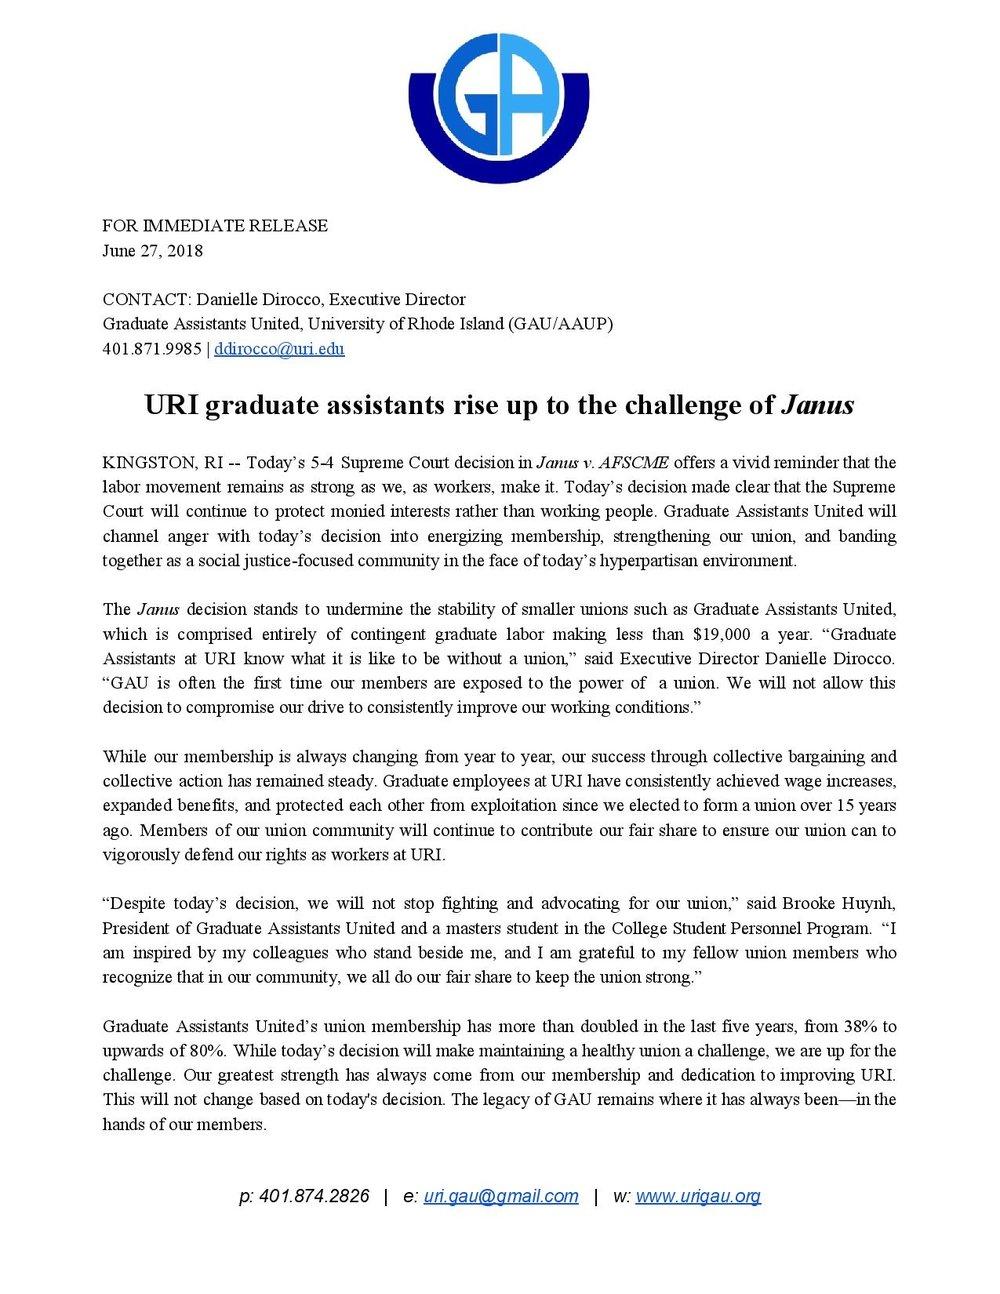 URI GAU Janus Statement 6_27_18.jpg